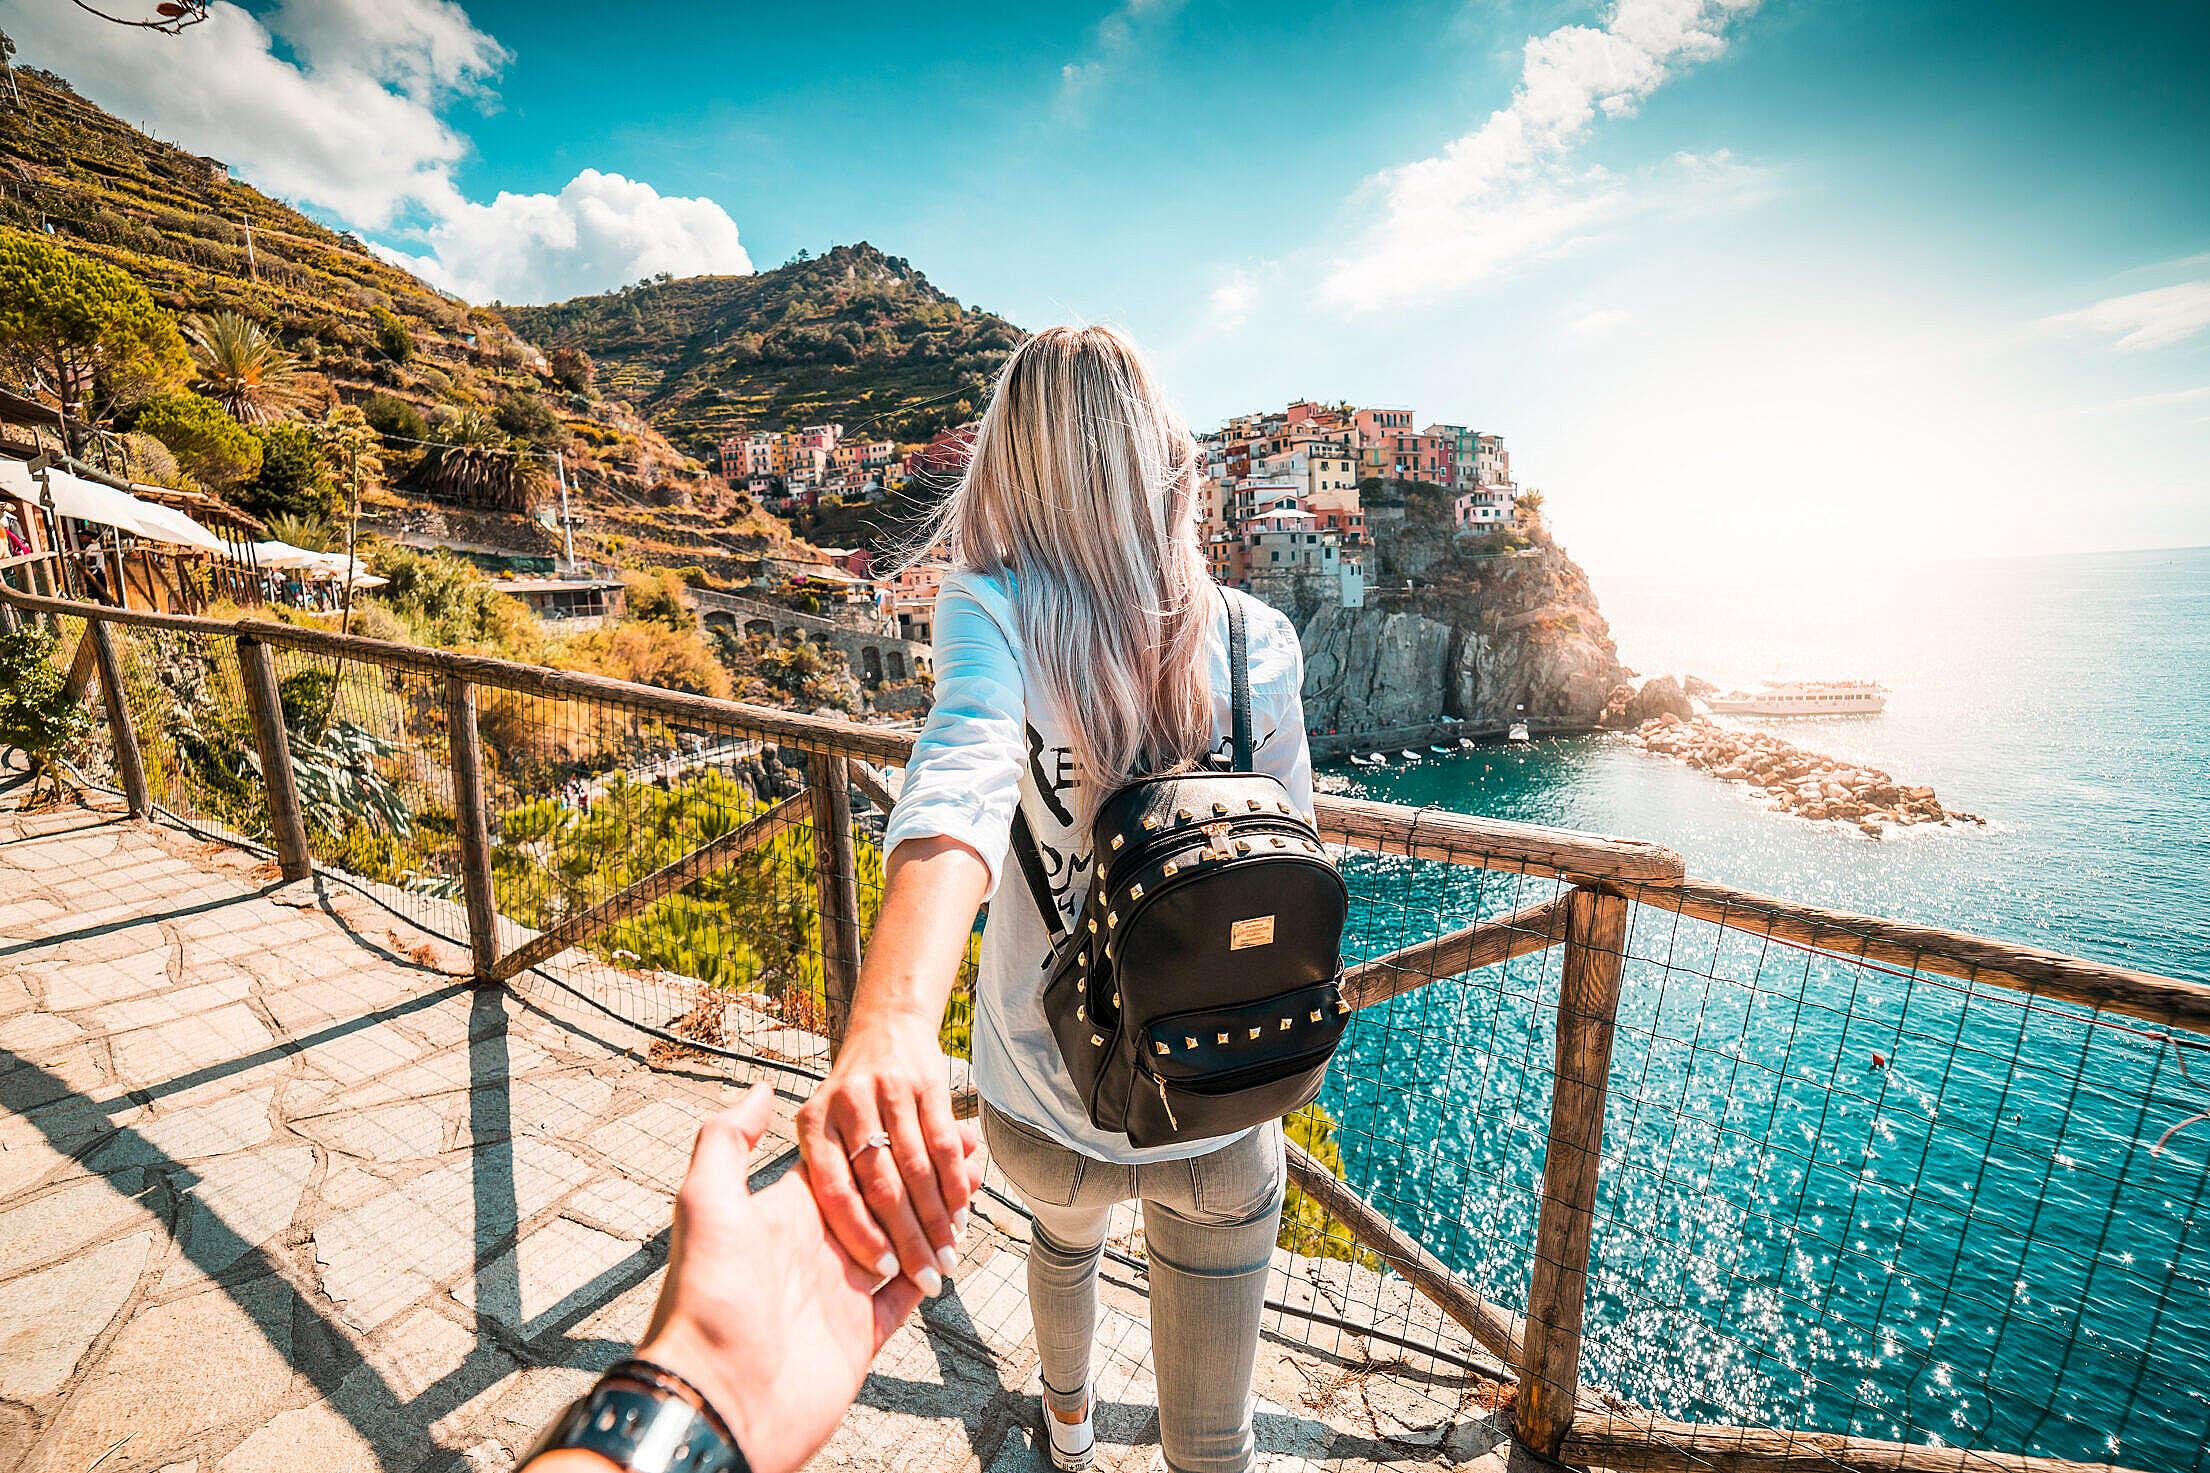 Traveling to Manarola, Cinque Terre Follow Me To Pose Free Stock Photo